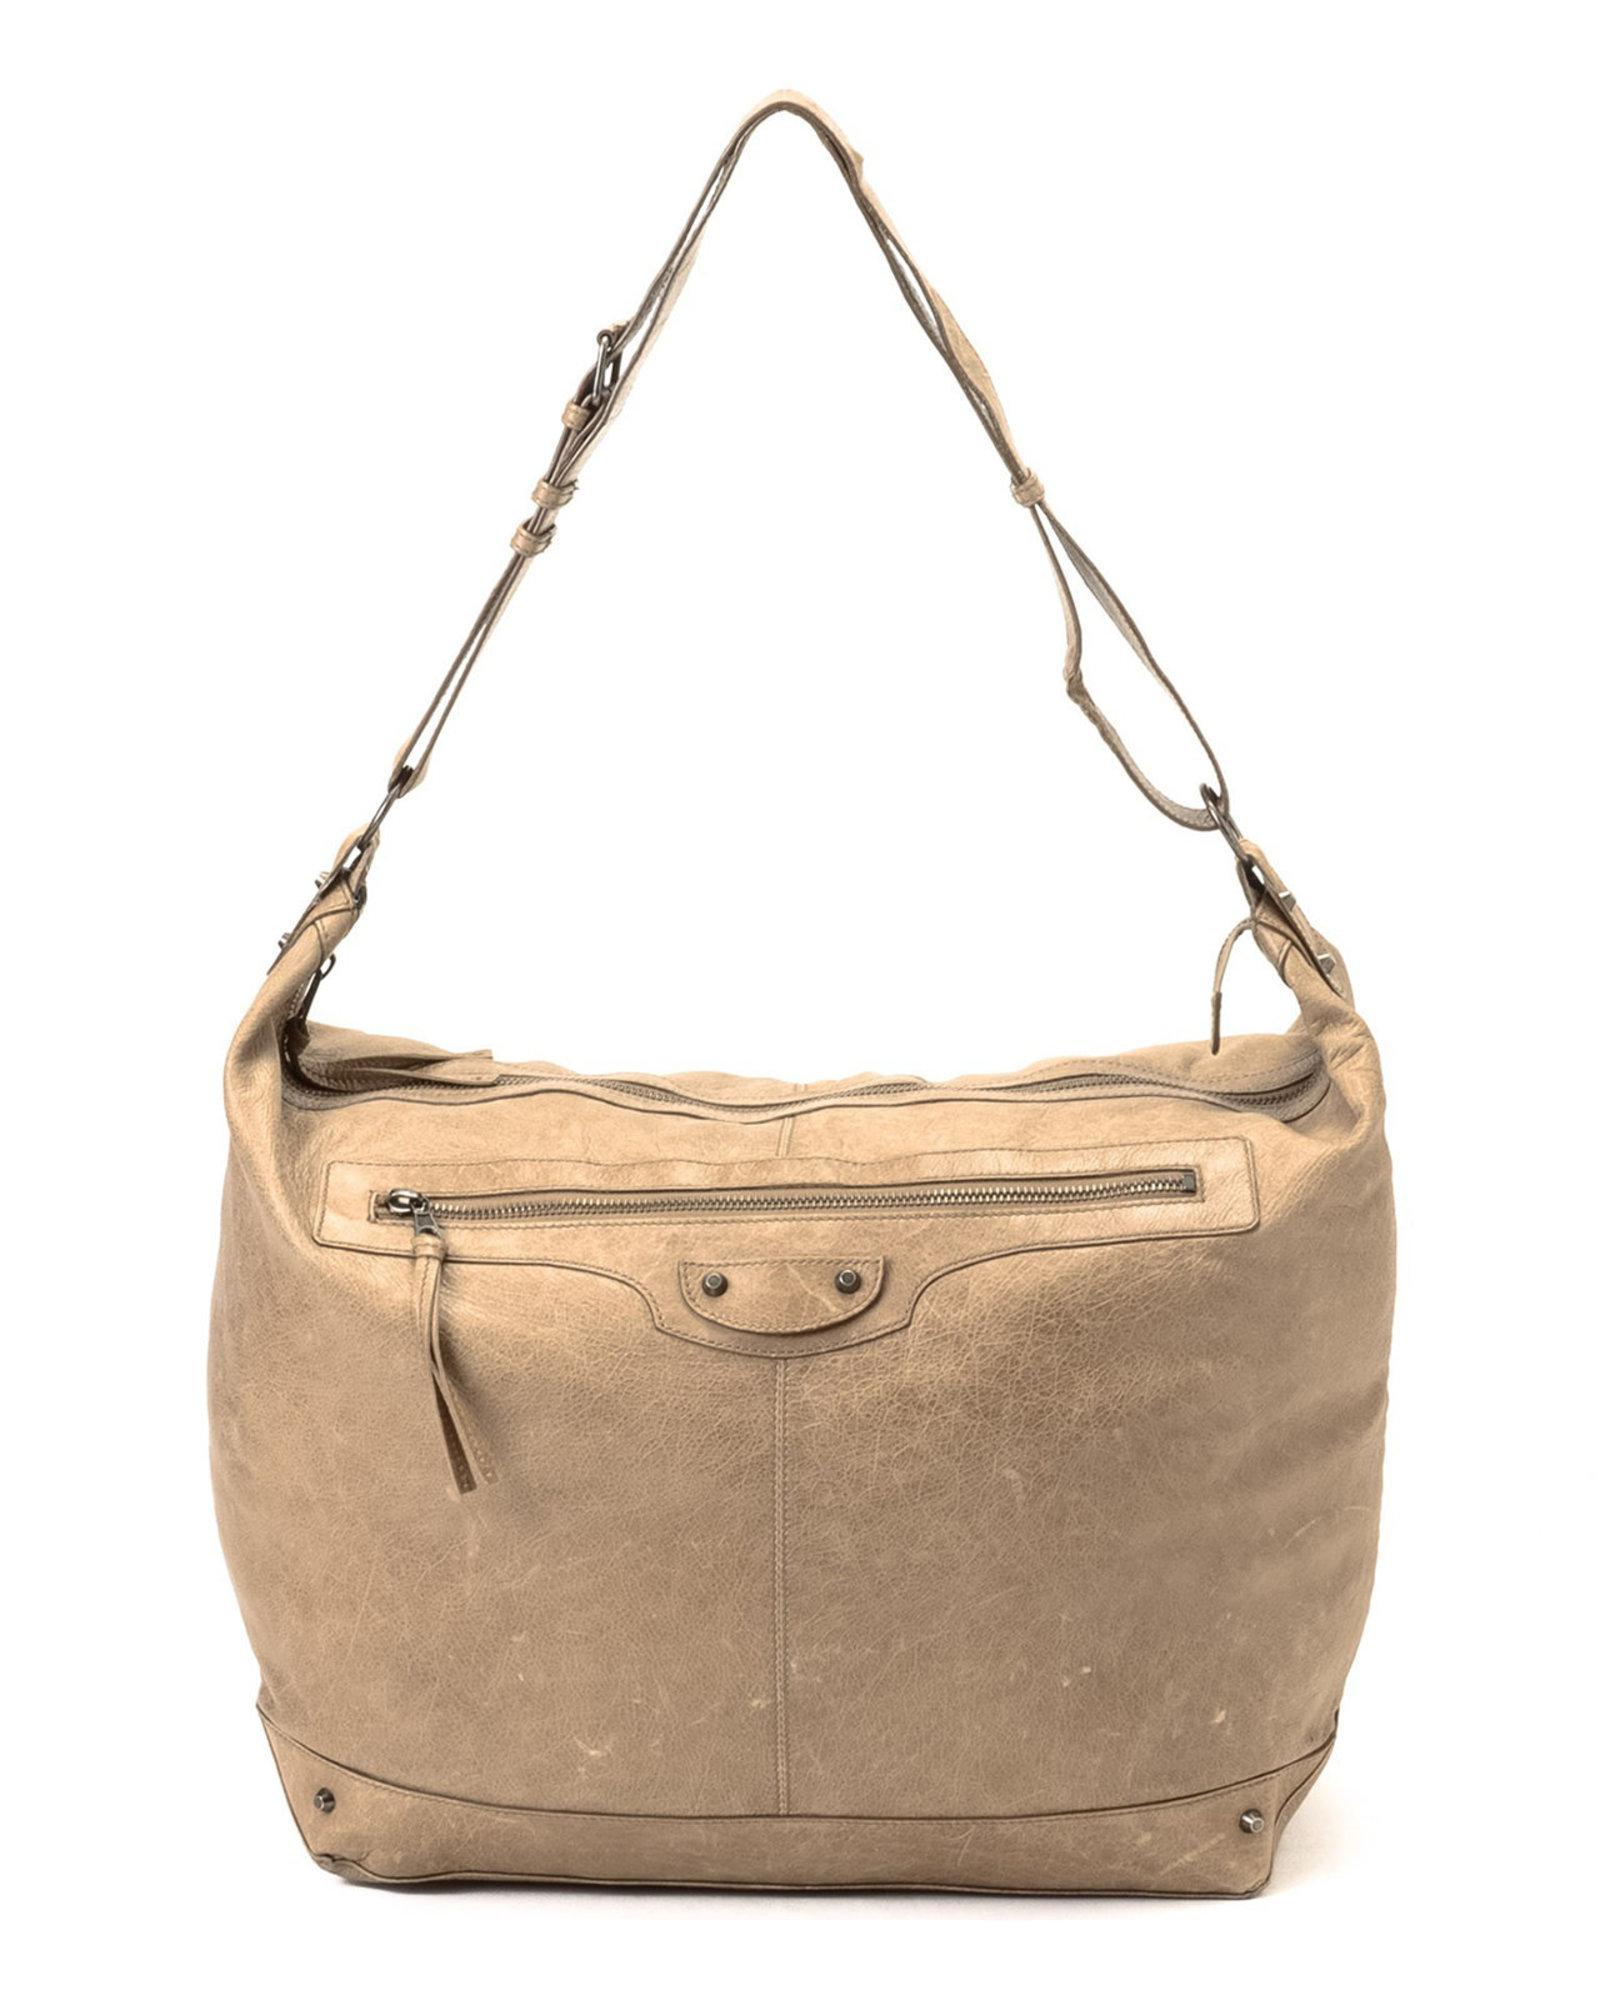 3e1c3d036f62f Lyst - Balenciaga Courier Shoulder Bag - Vintage